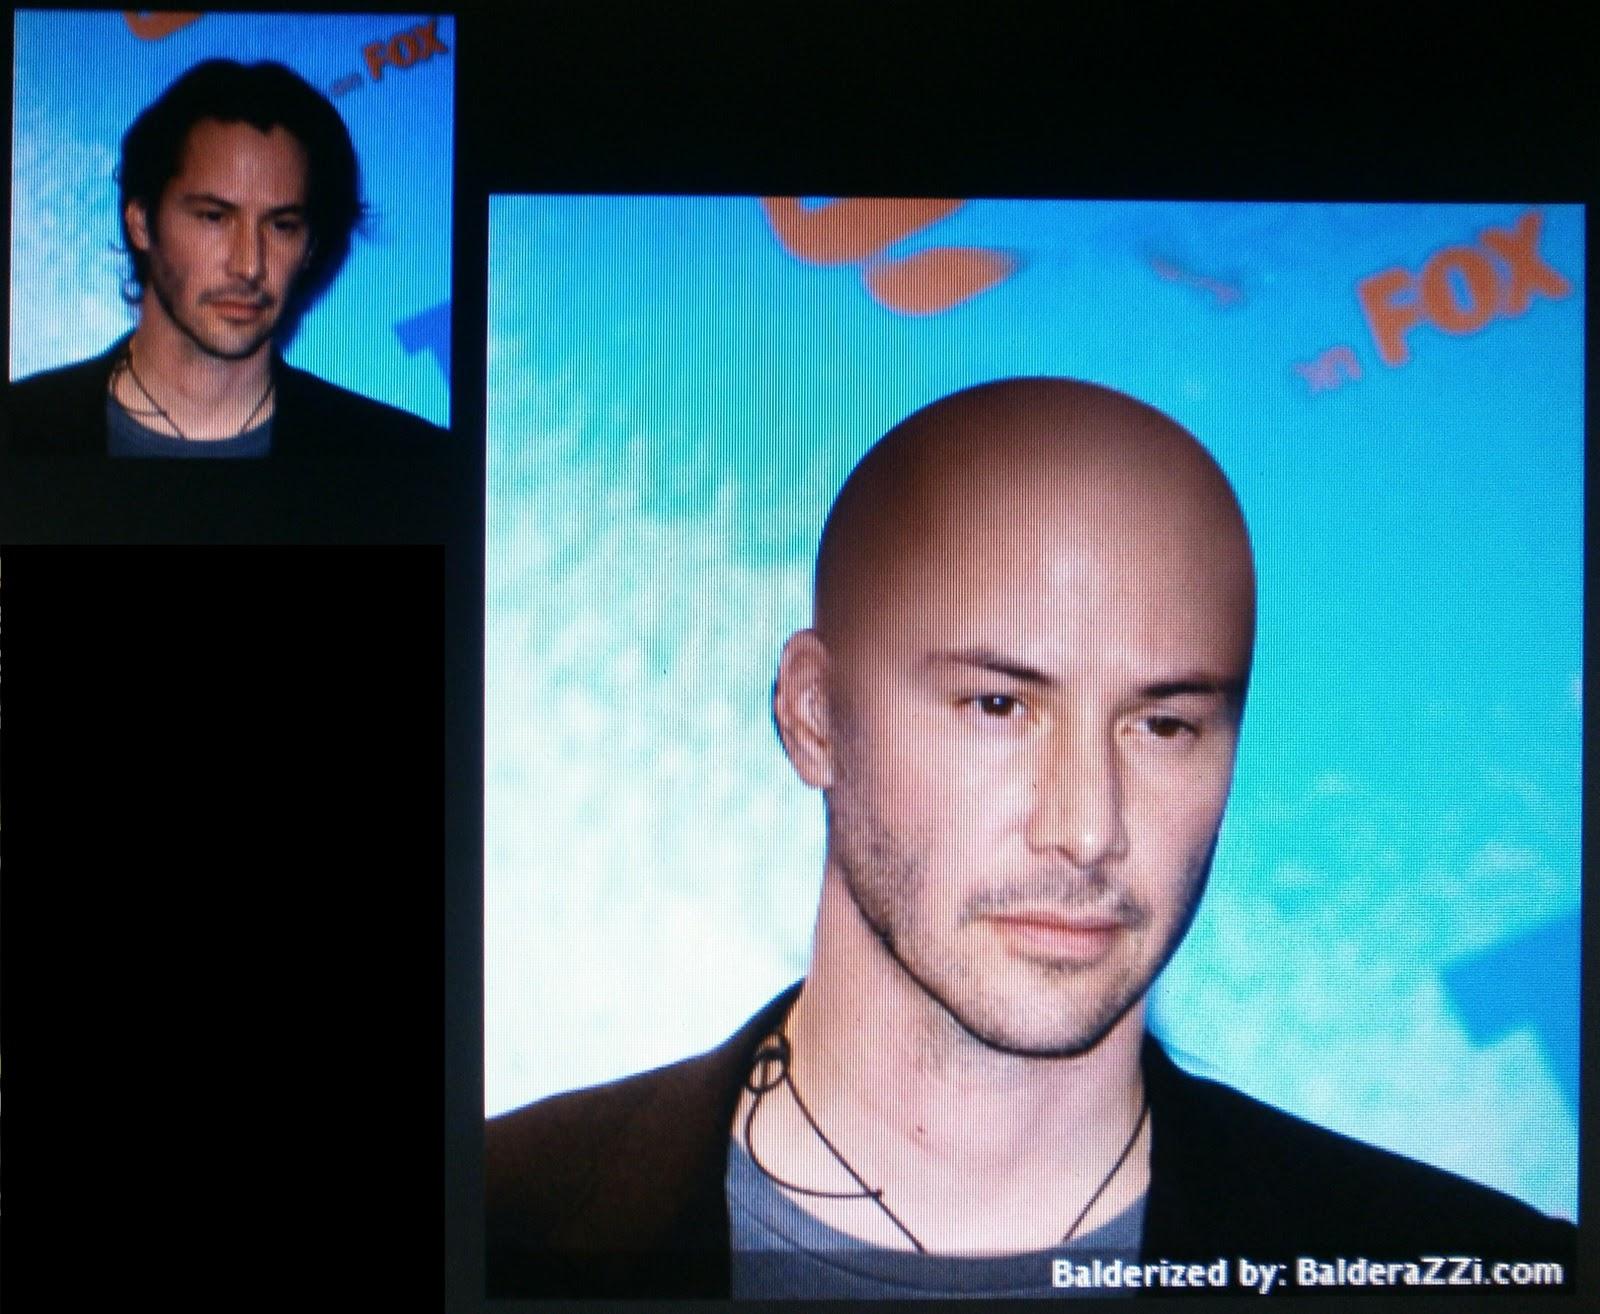 http://4.bp.blogspot.com/-dUEGLjcKIN0/TxbXEvfwsiI/AAAAAAAABbs/4XdyVpZvfrA/s1600/Bald+Keanu+Reeves.jpg